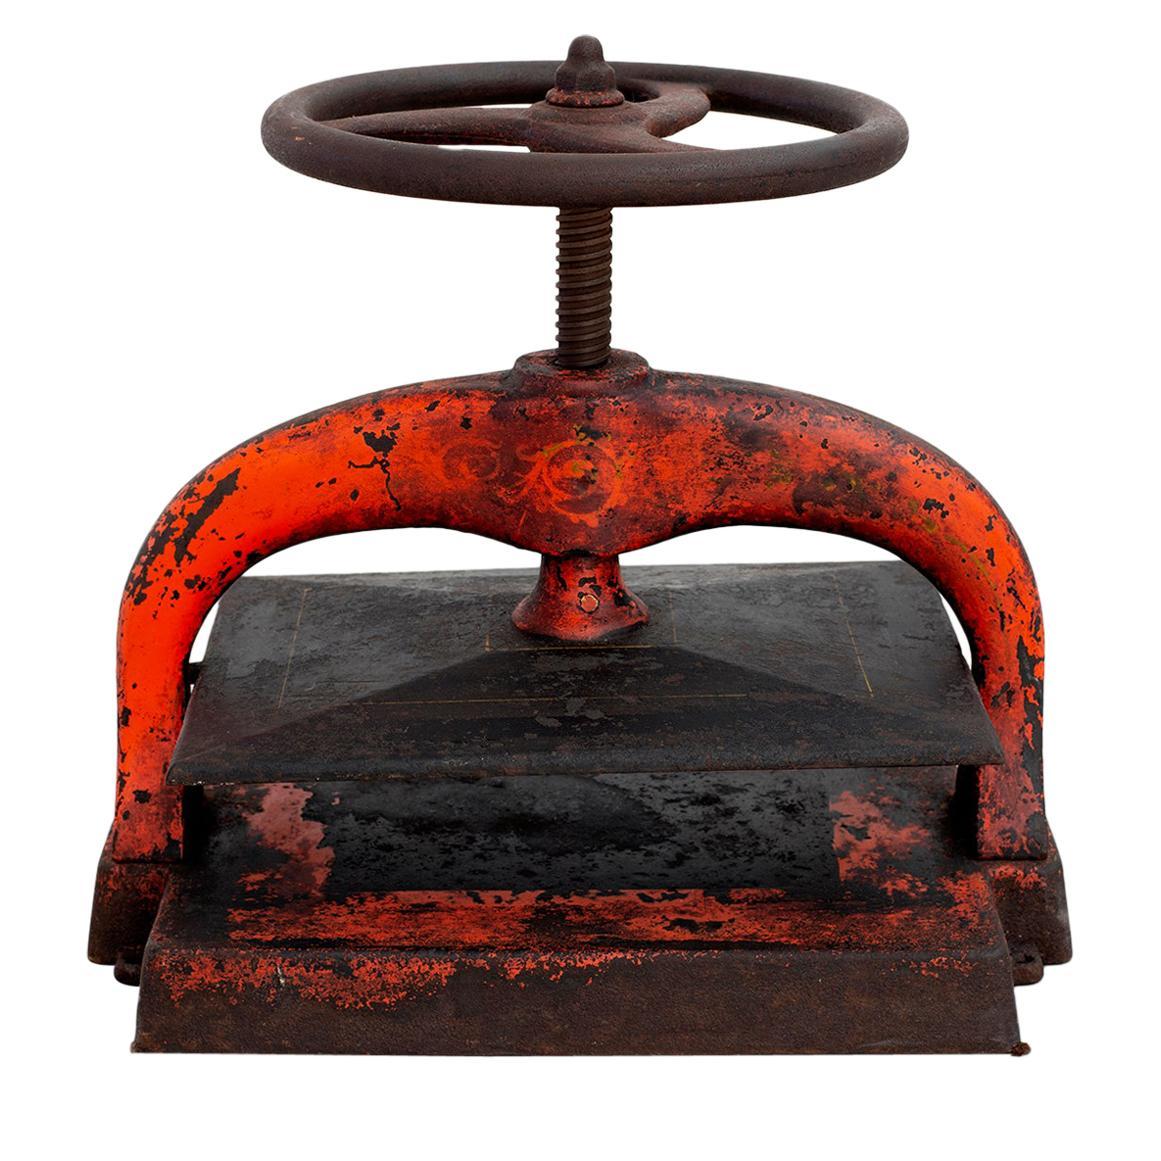 Industrial Book Press